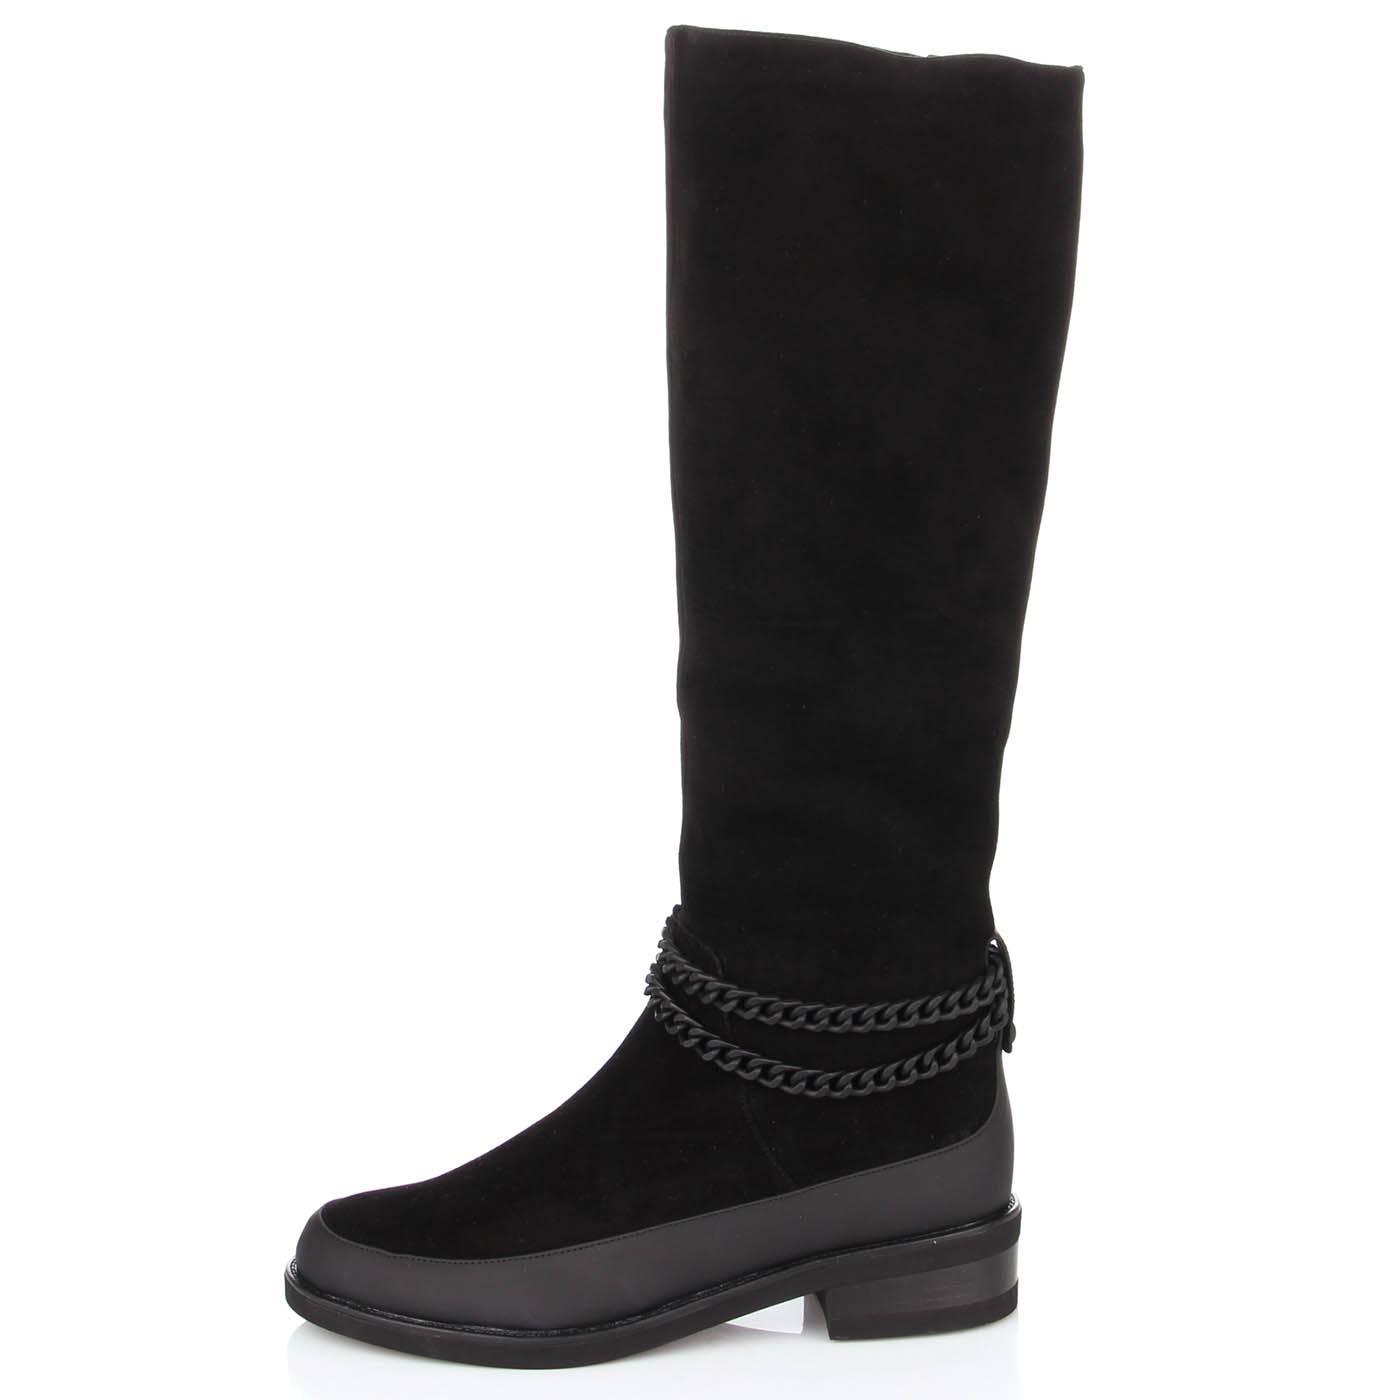 Чоботи жіночі ditto 5896 Чорний купить по выгодной цене в интернет ... b2d9f60d46c0b